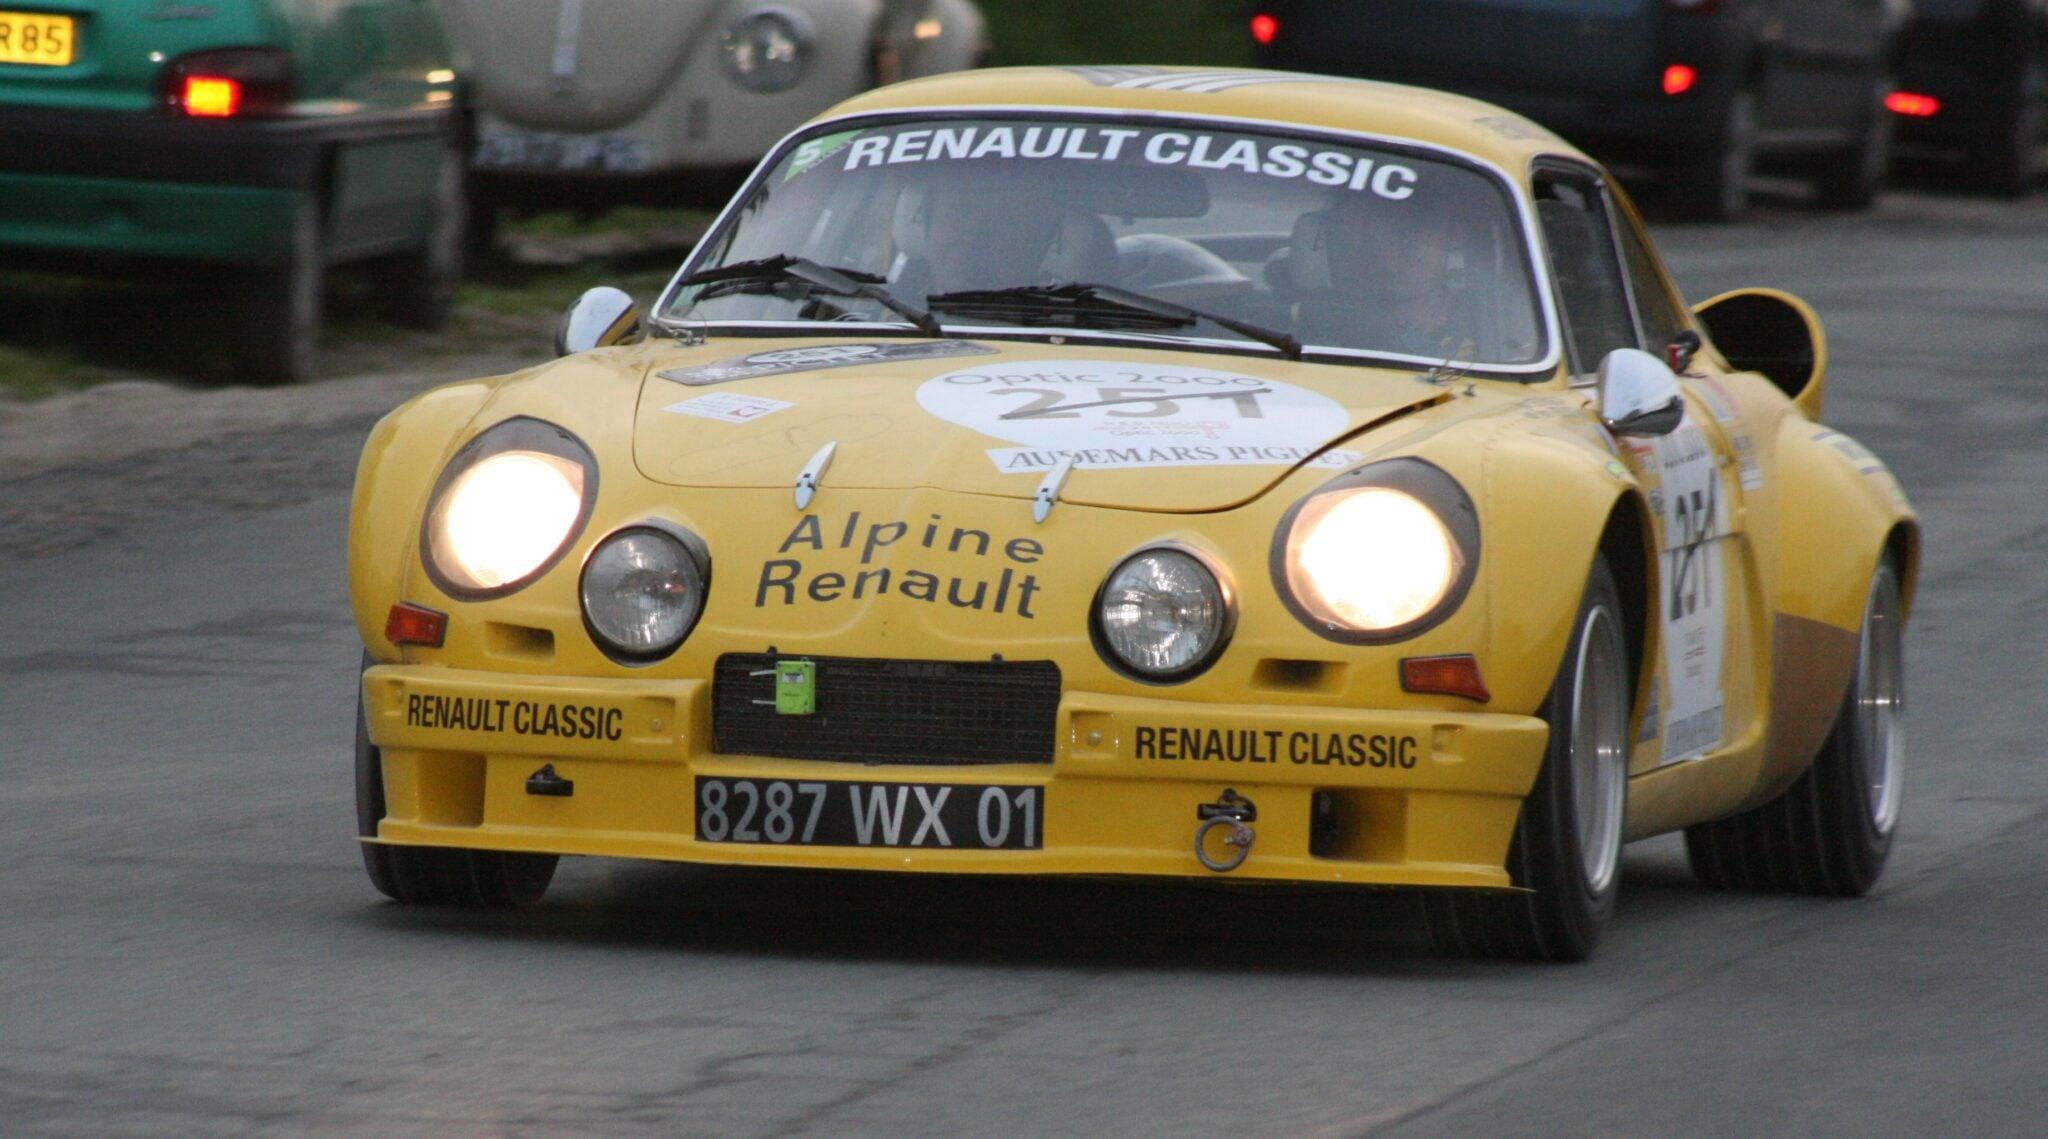 Alpine A110 1800 16S Gr 5 2 | L'Alpine A110 1800 16S Gr 5, l'ultime évolution !